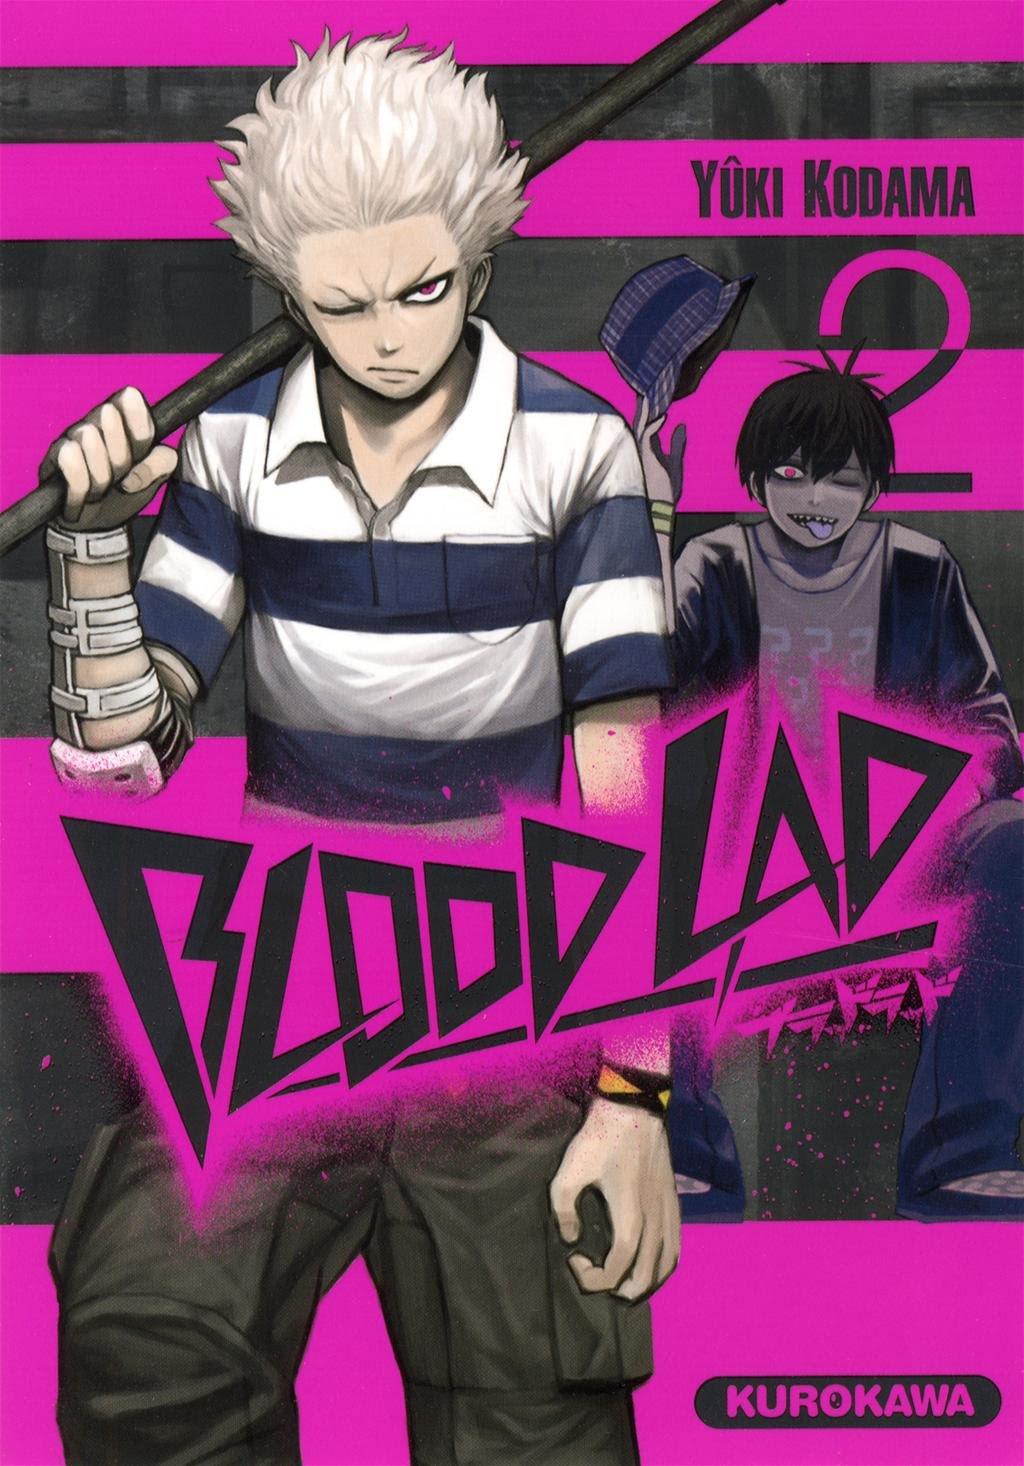 http://lesvictimesdelouve.blogspot.fr/2015/01/blood-lad-tome-2-de-yuki-kodama.html